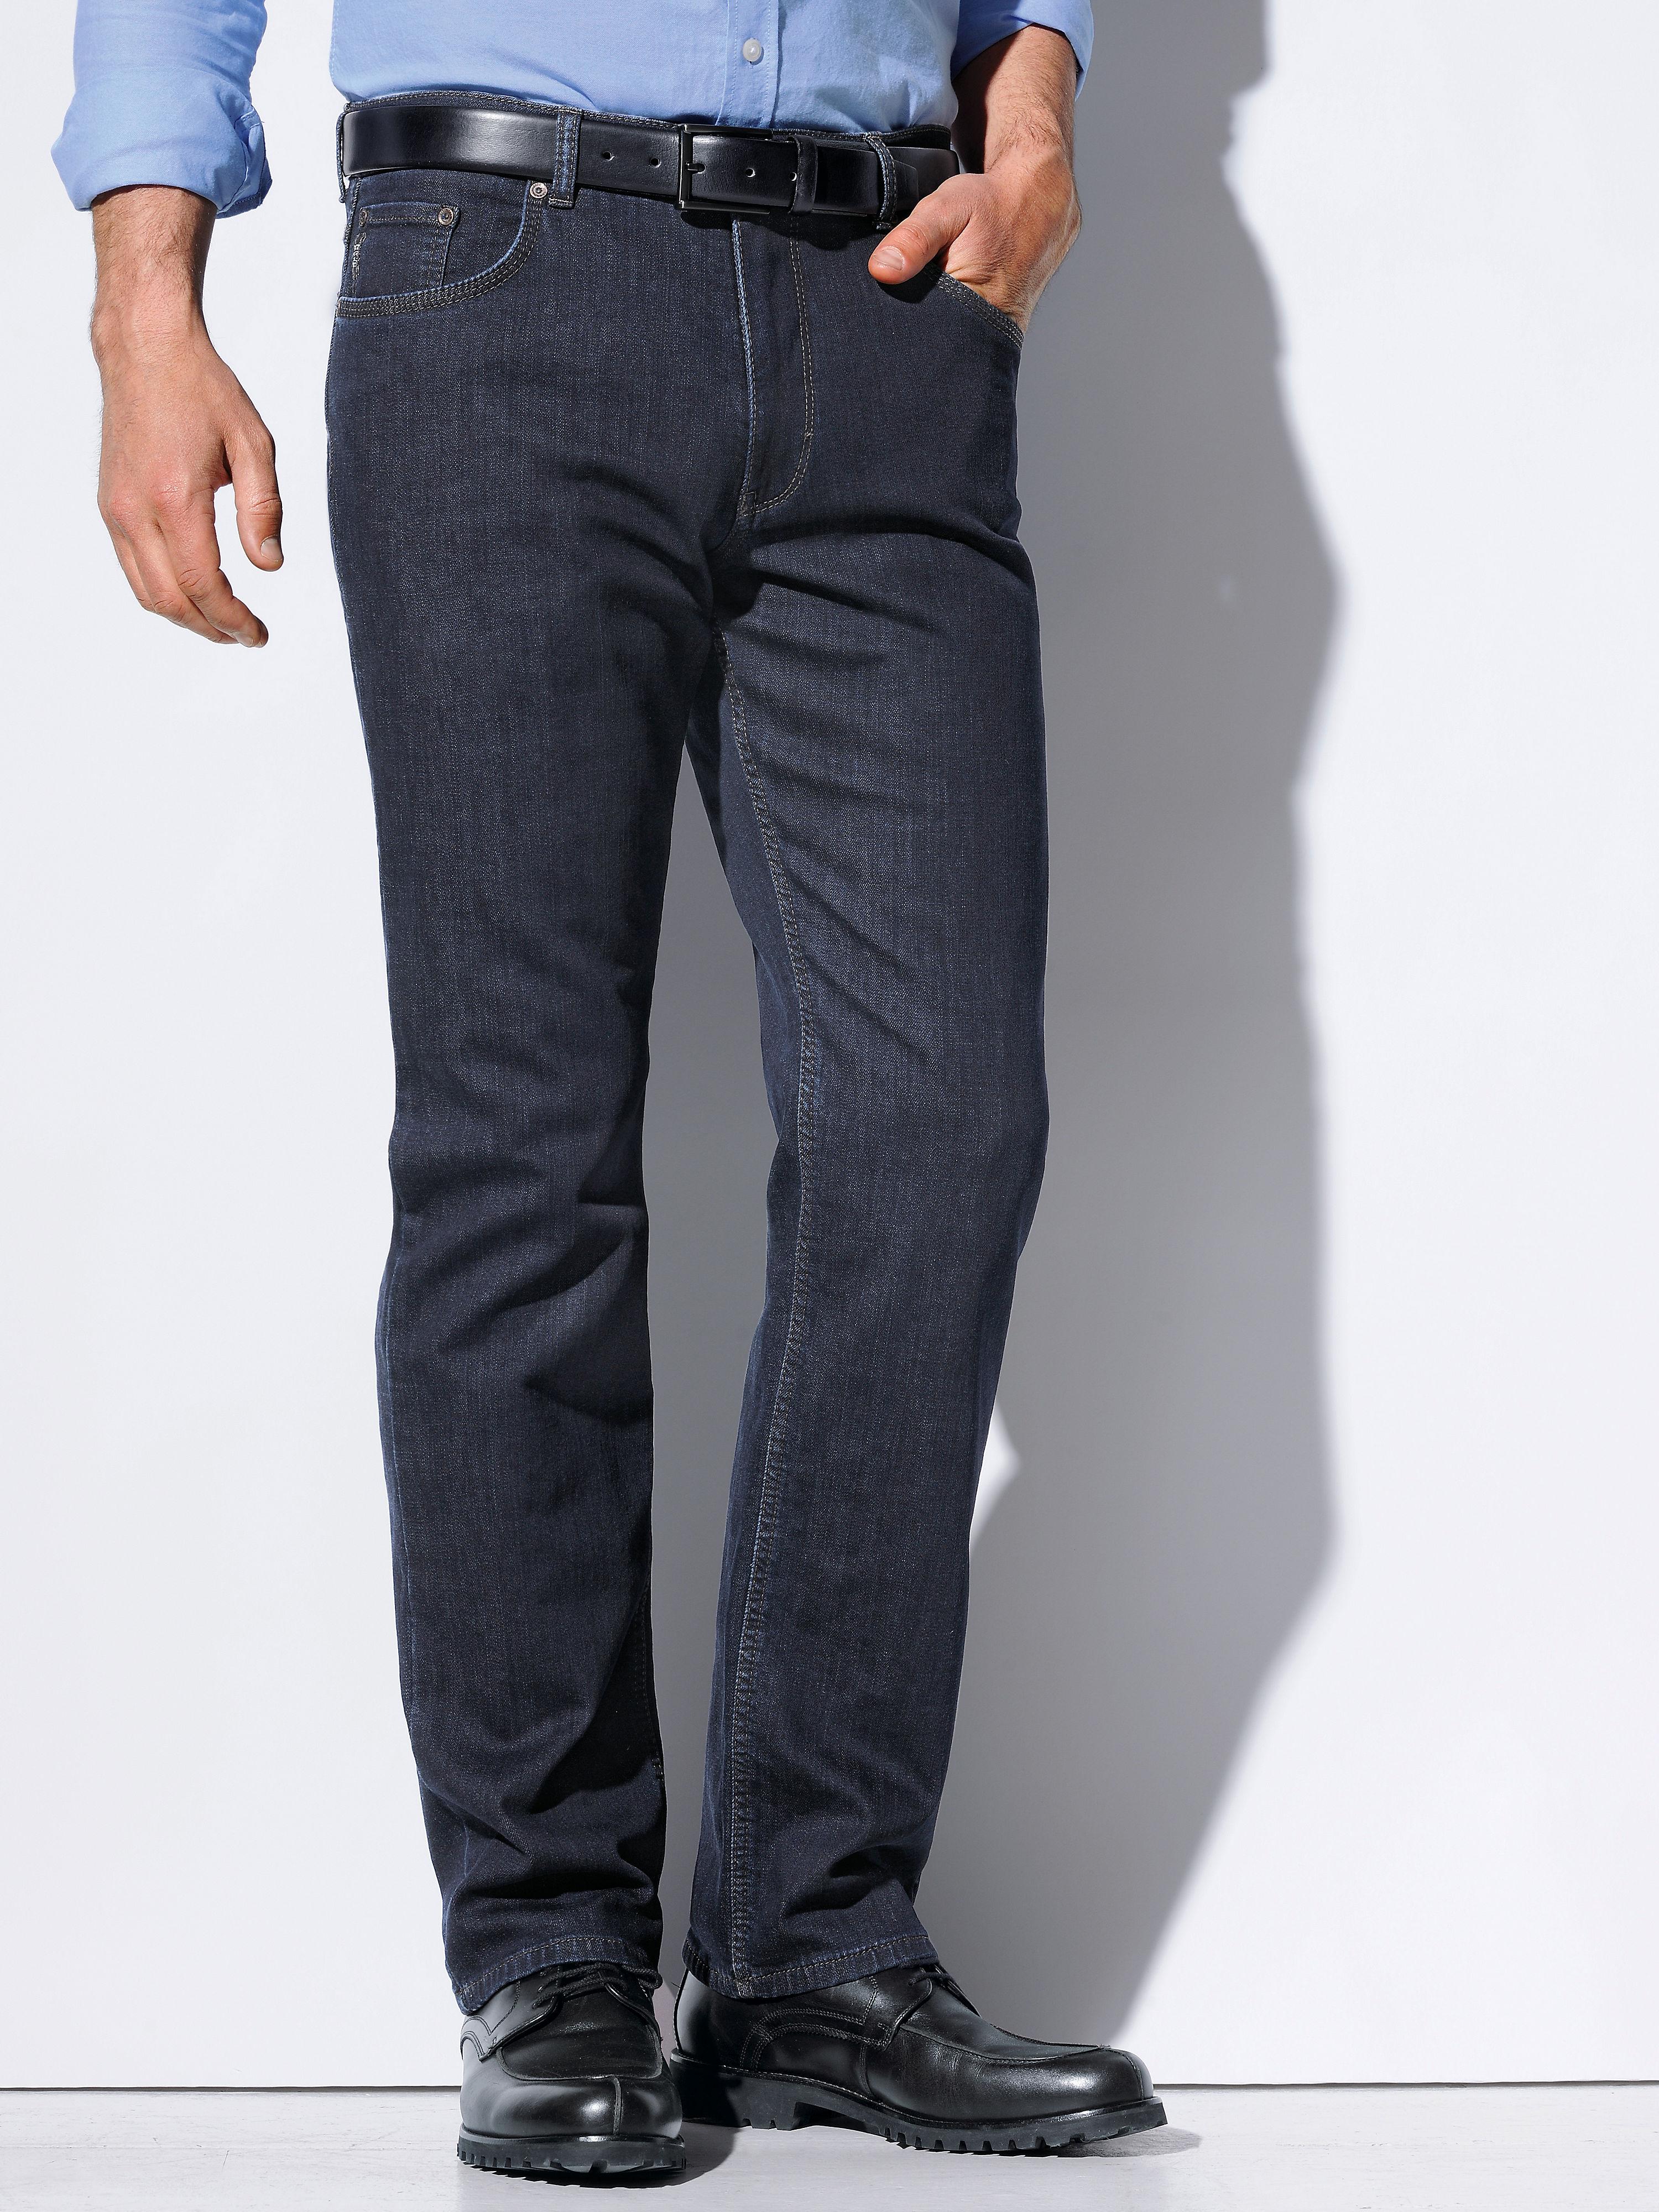 Thermal trousers – COOPER from Brax Feel Good denim